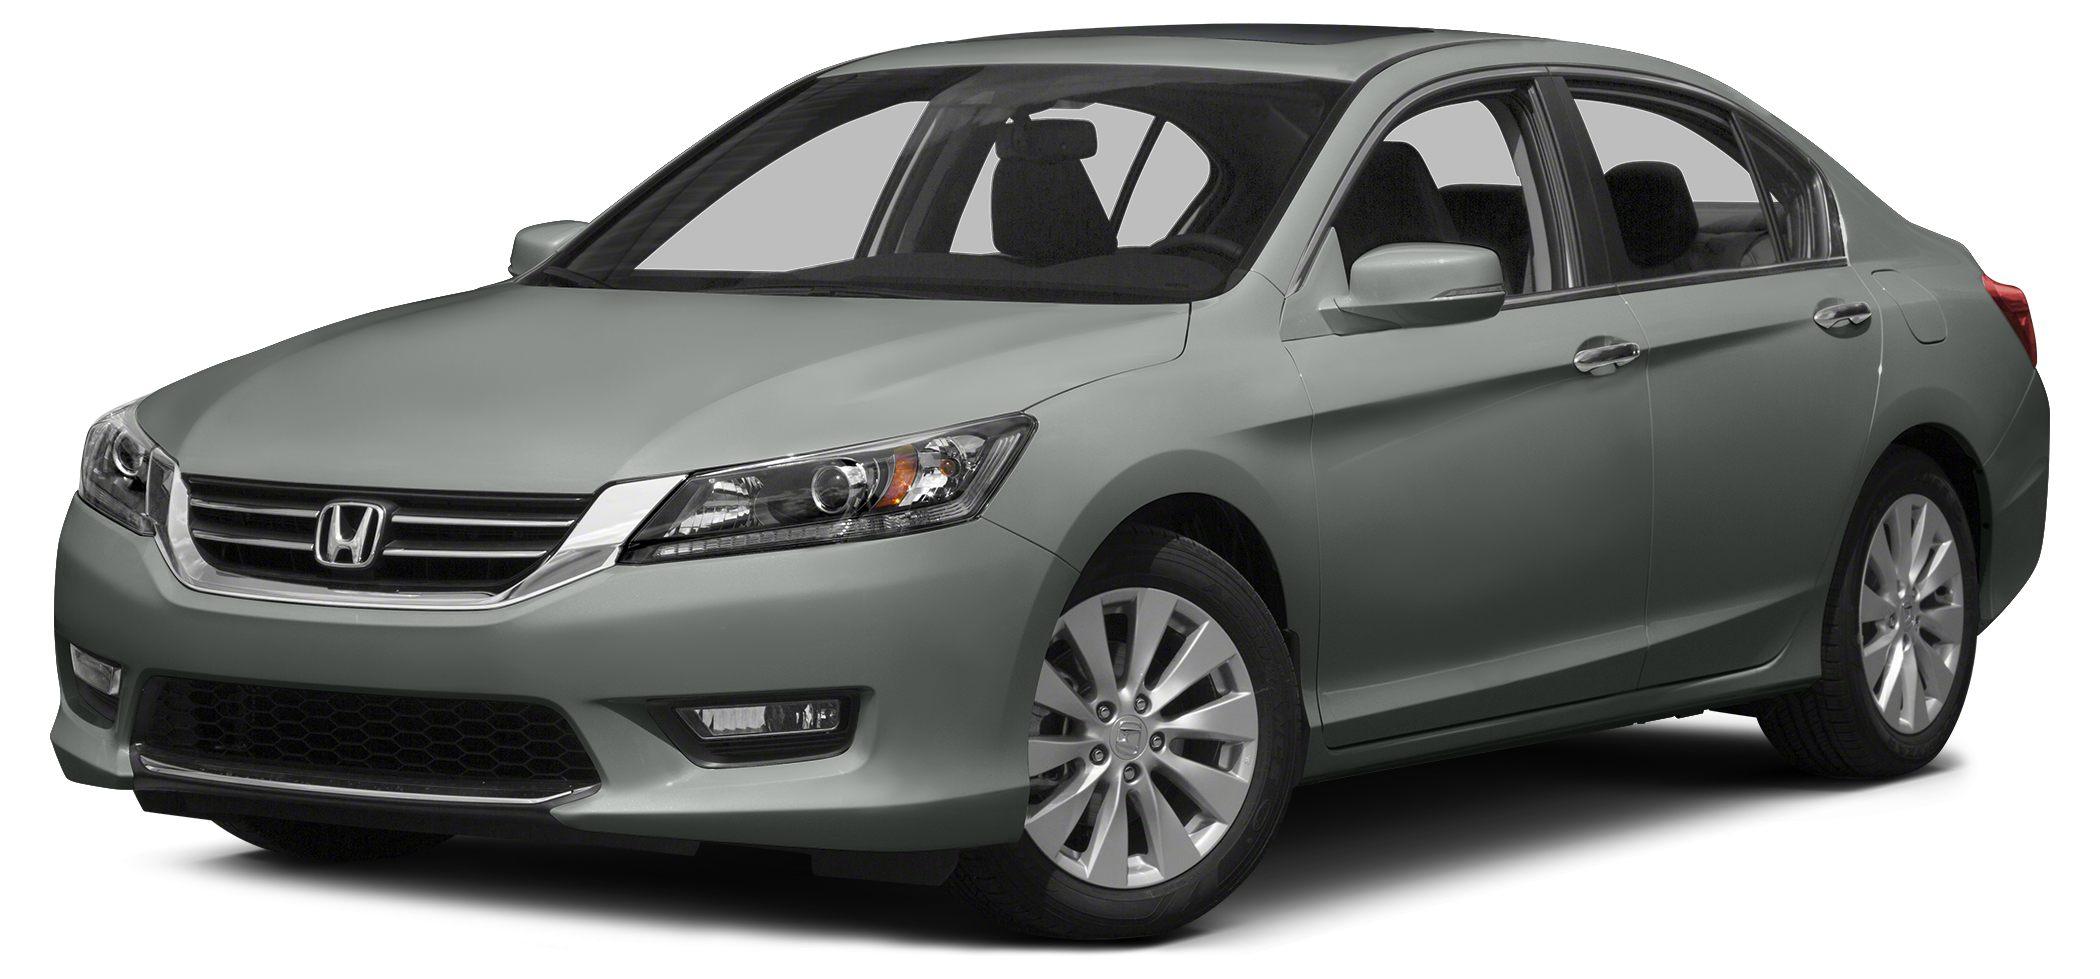 2013 Honda Accord EX-L V6 CARFAX 1-Owner EX-L trim FUEL EFFICIENT 34 MPG Hwy21 MPG City Sunroo